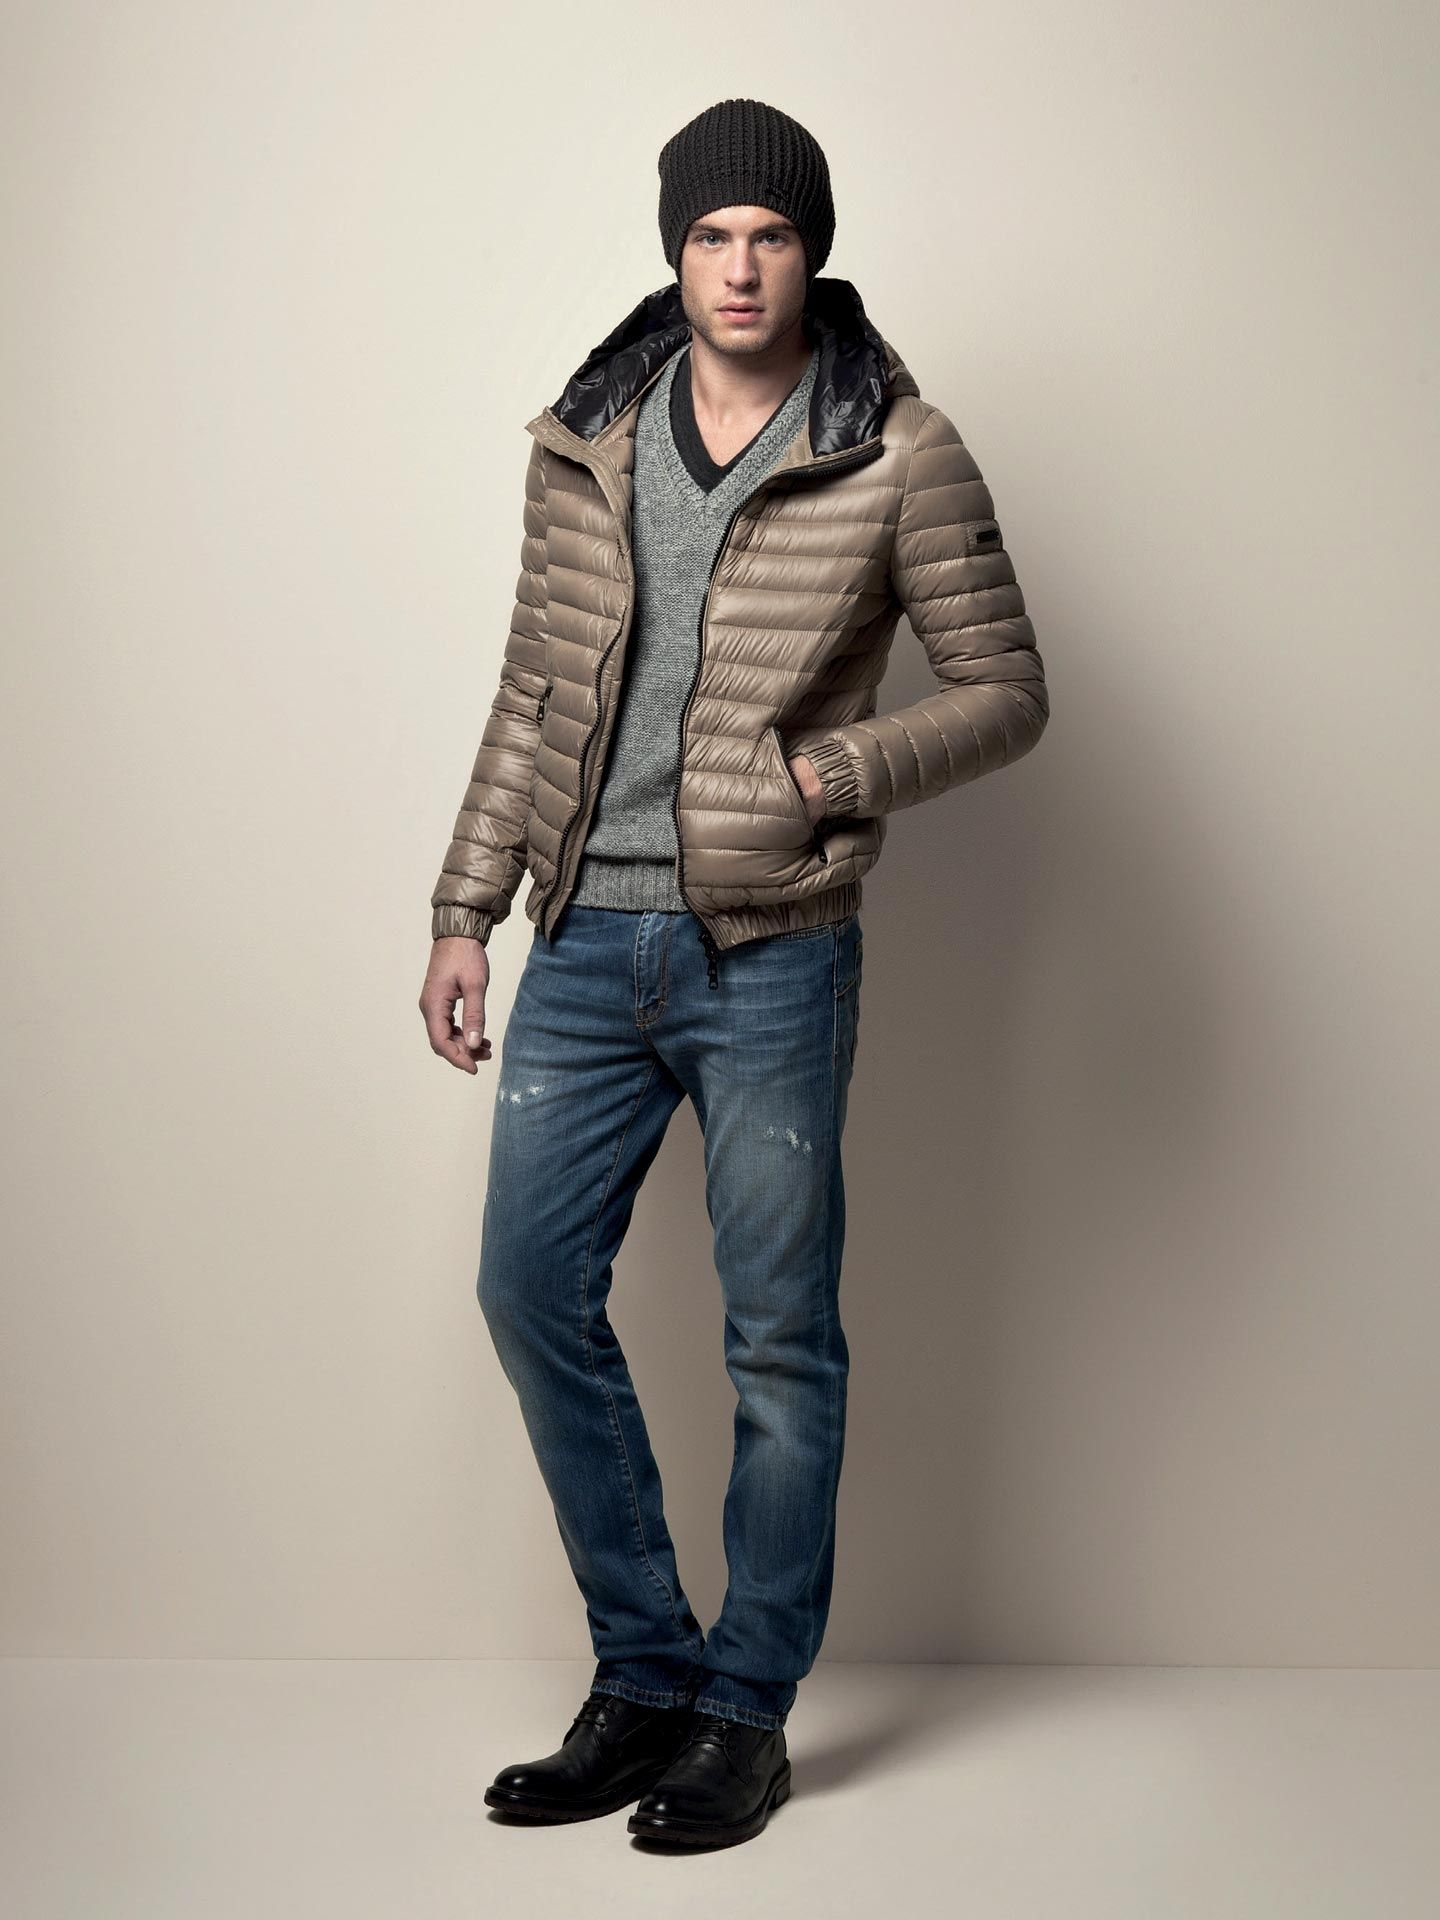 031ae0f105 LIU JO JEANS MAN FW13 me gusta el | all dressed up | Mens fashion:__ ...